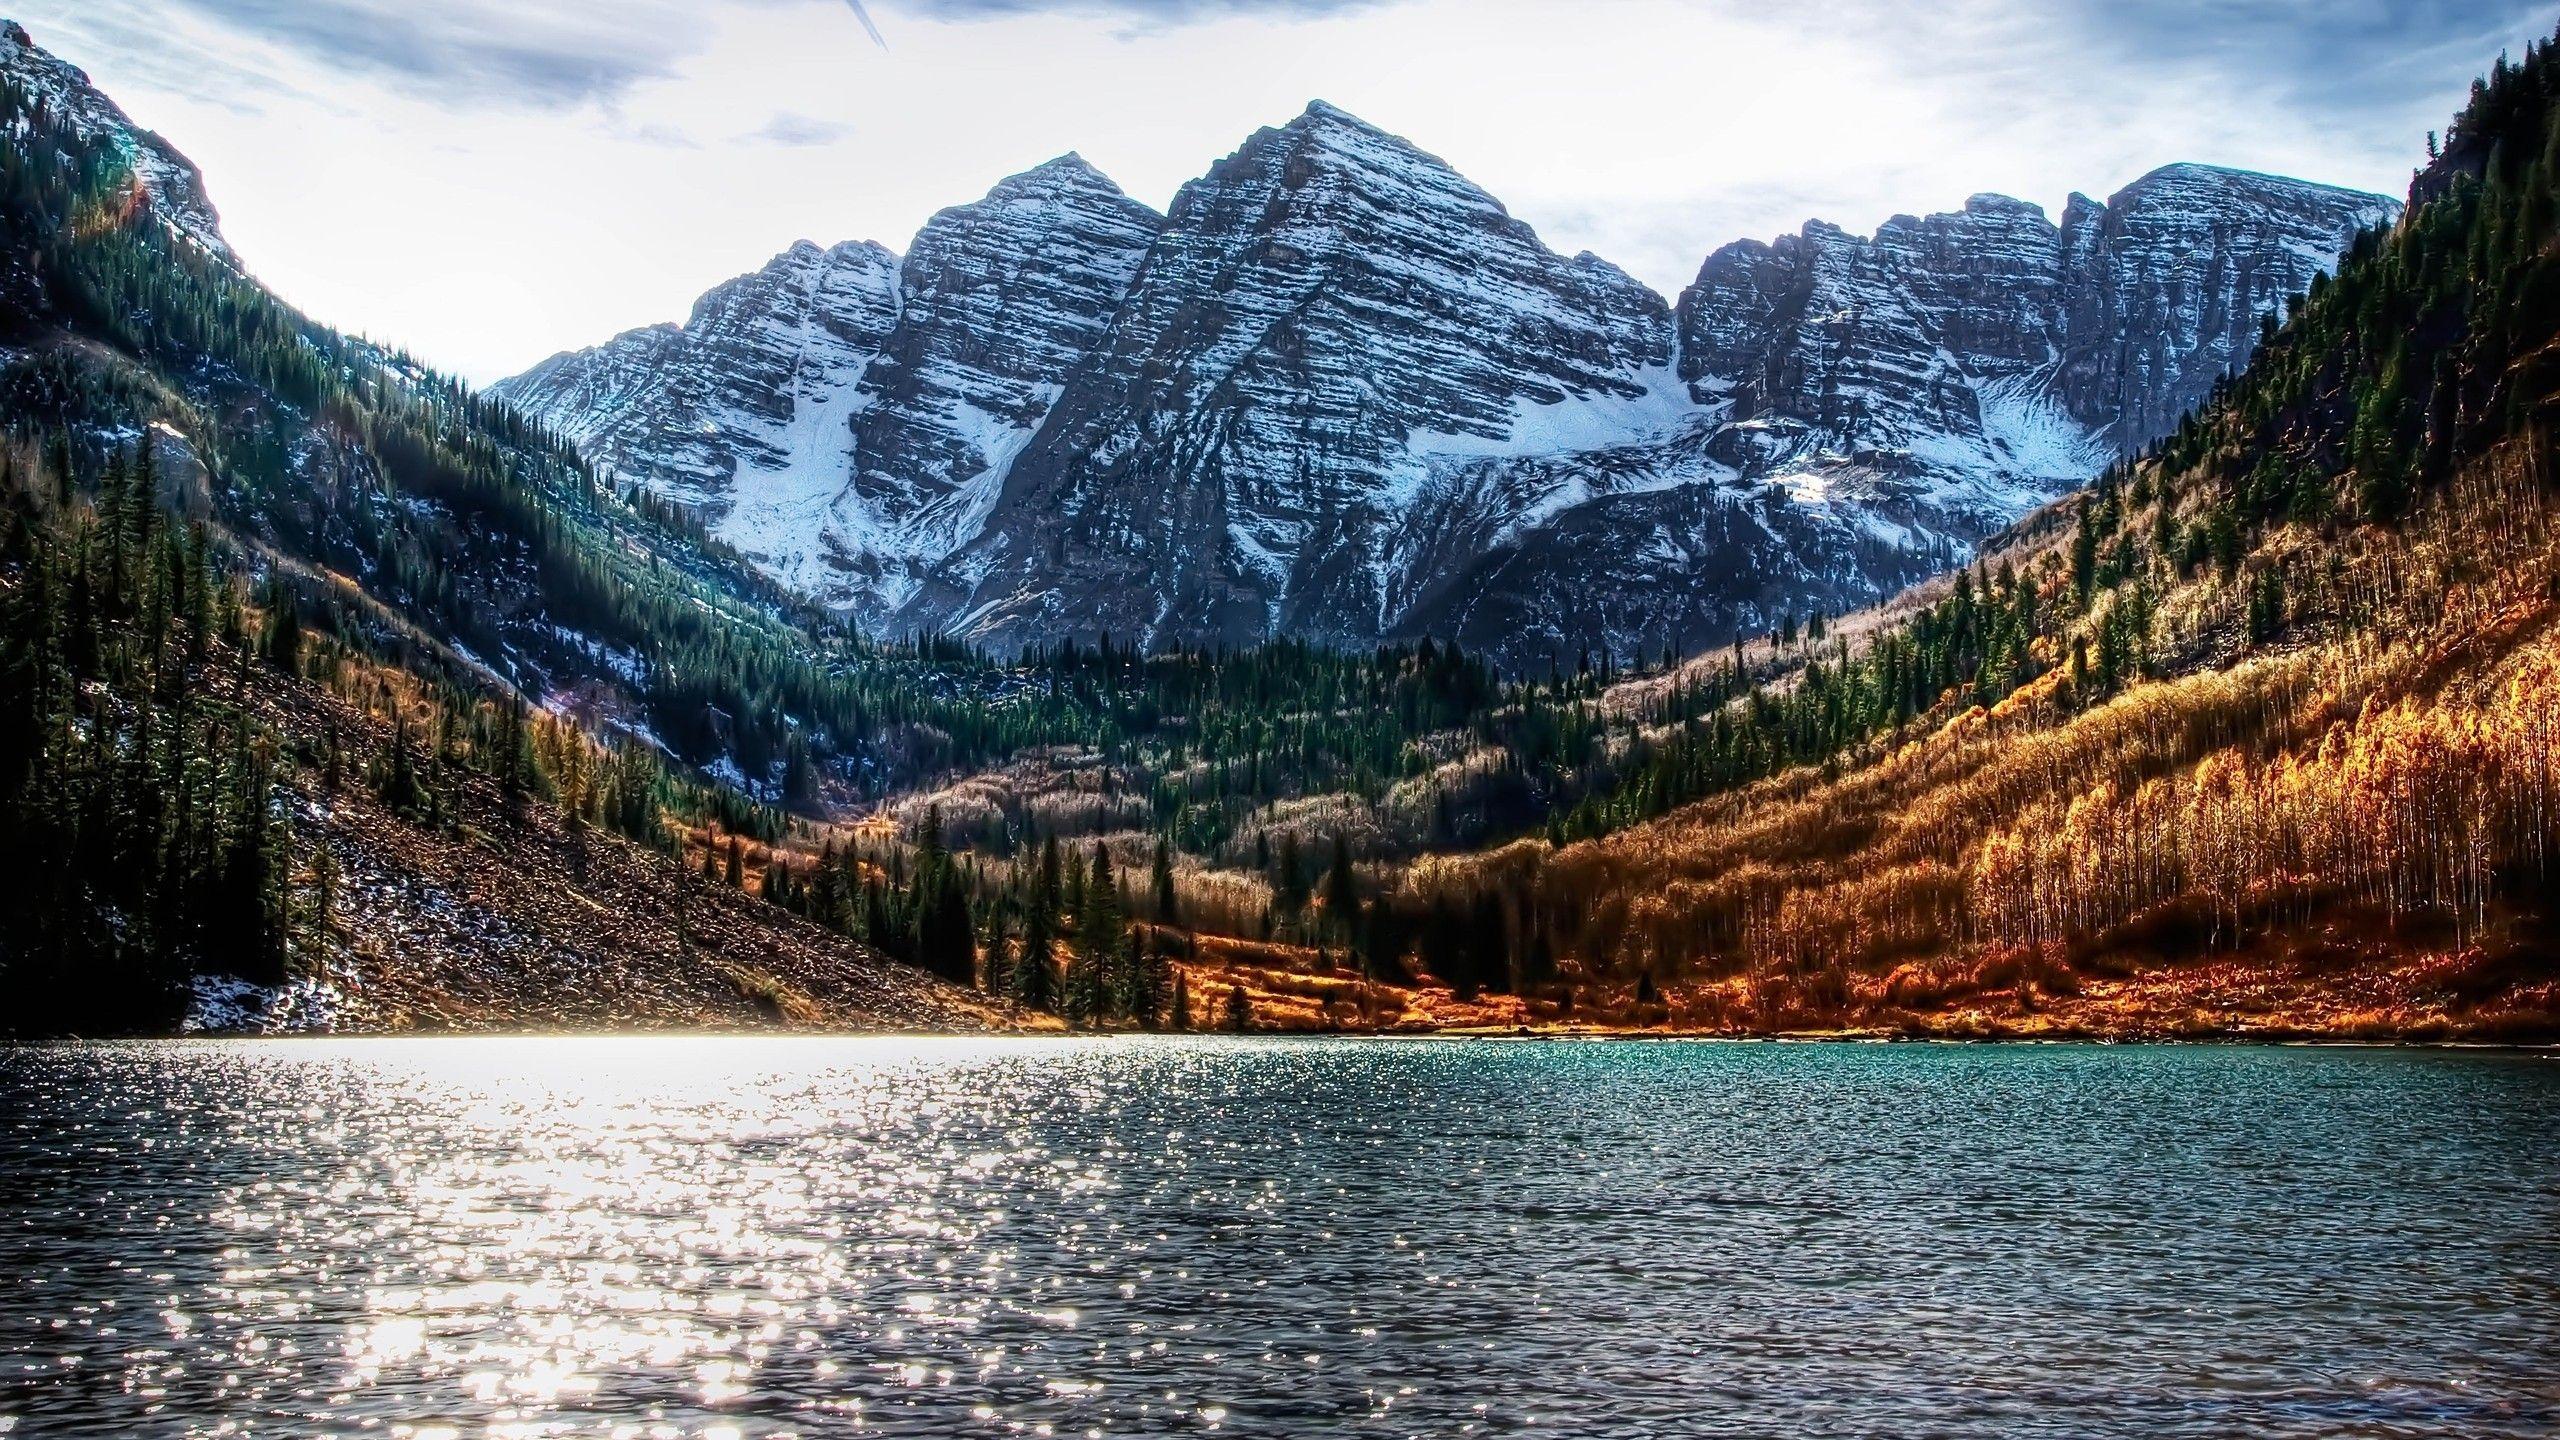 57 Colorado Desktop Wallpapers On Wallpaperplay Colorado Winter Colorado Mountains Winter Mountain Landscape